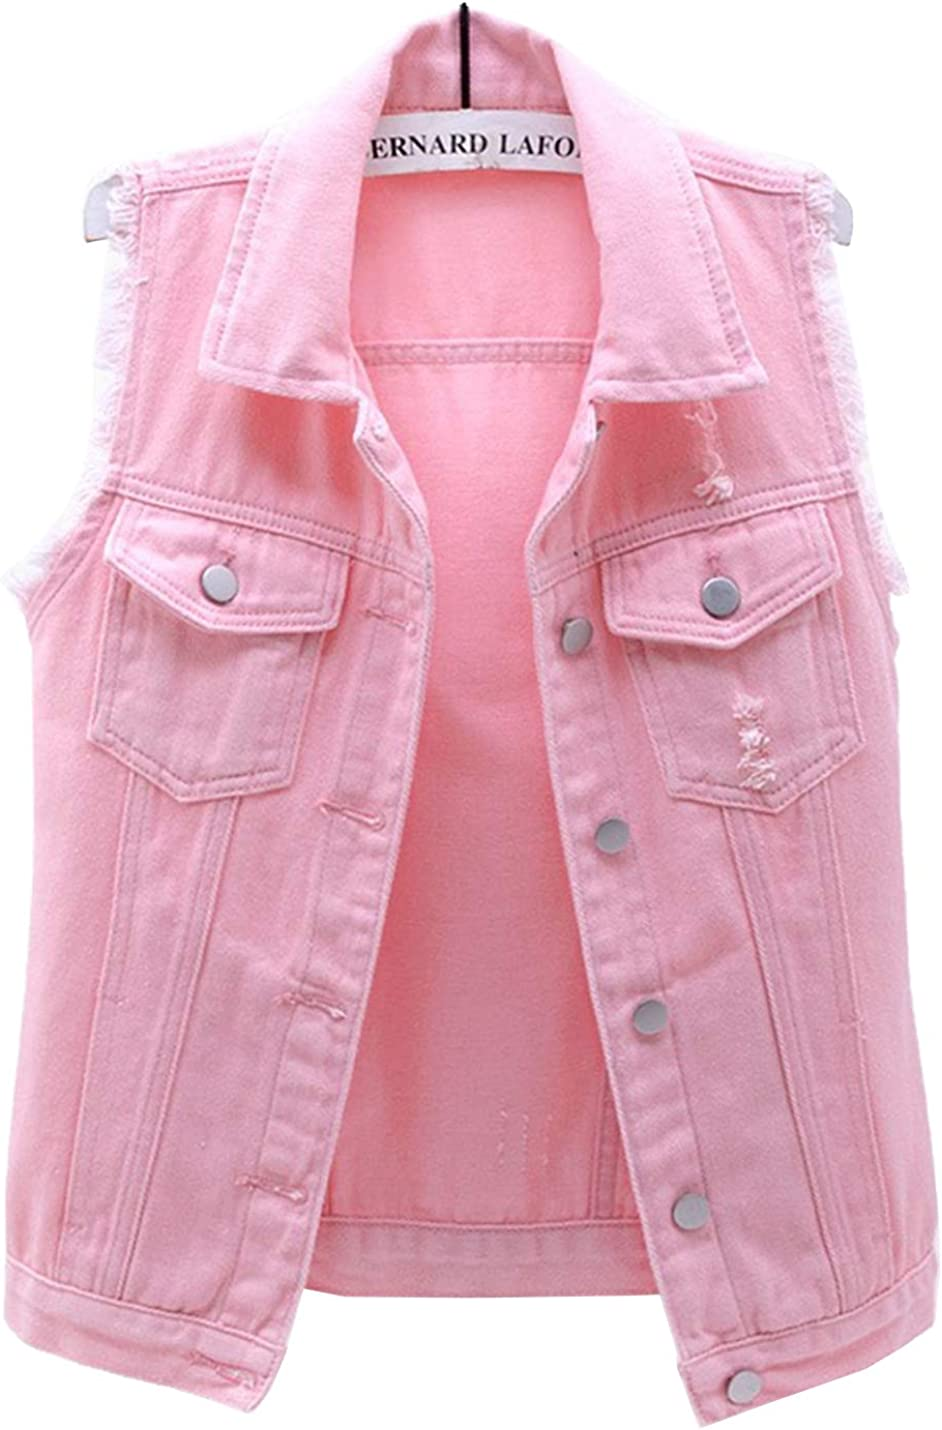 PEHMEA Women's Girls Distressed Sleeveless Button Up Cropped Jean Denim Jacket Vest